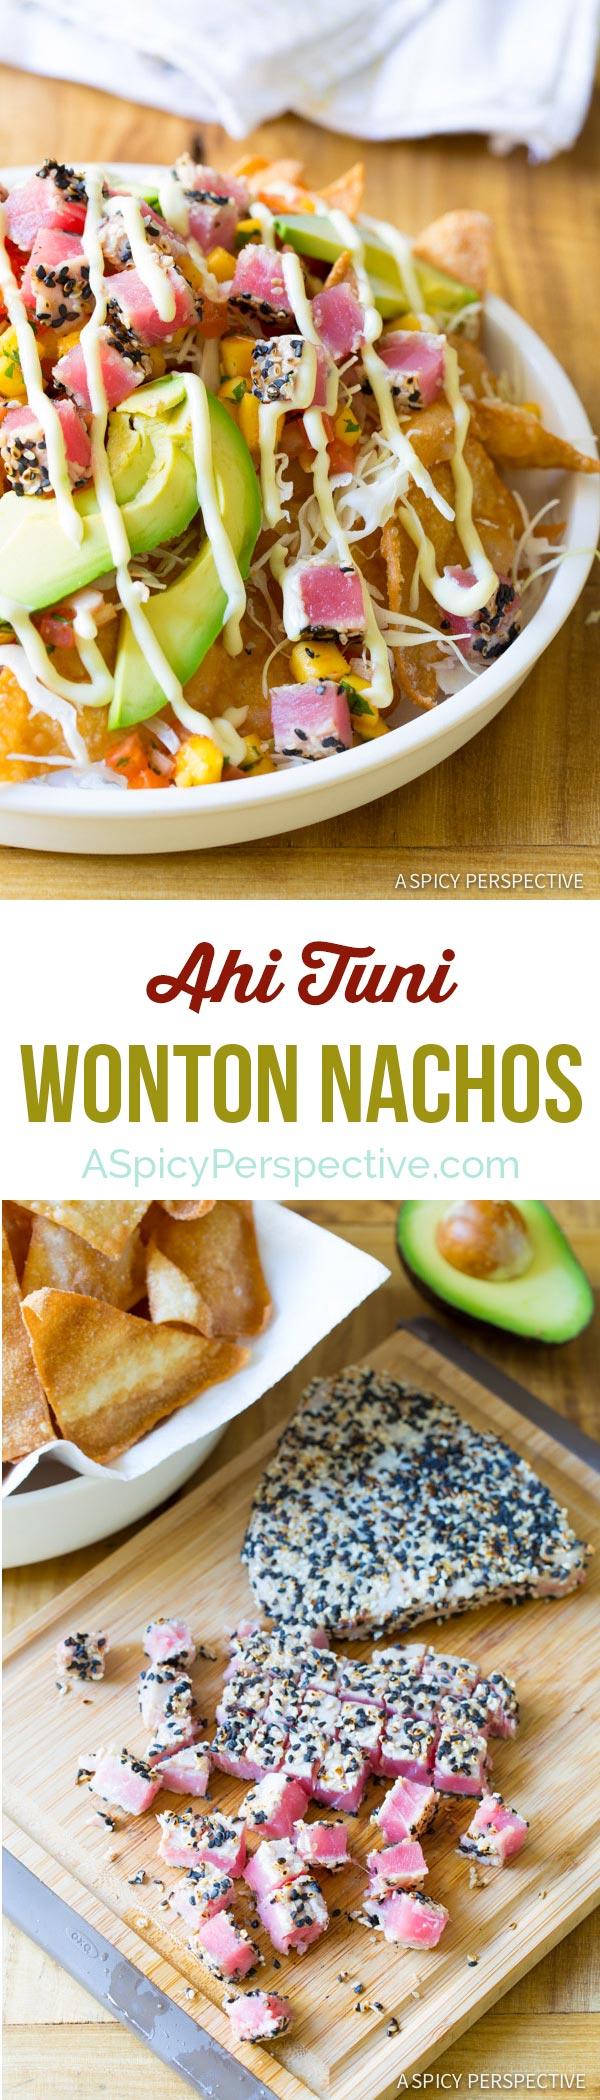 Amazing and Easy to Make Ahi Wonton Nachos with Mango Salsa and Wasabi Mayo! #nachos